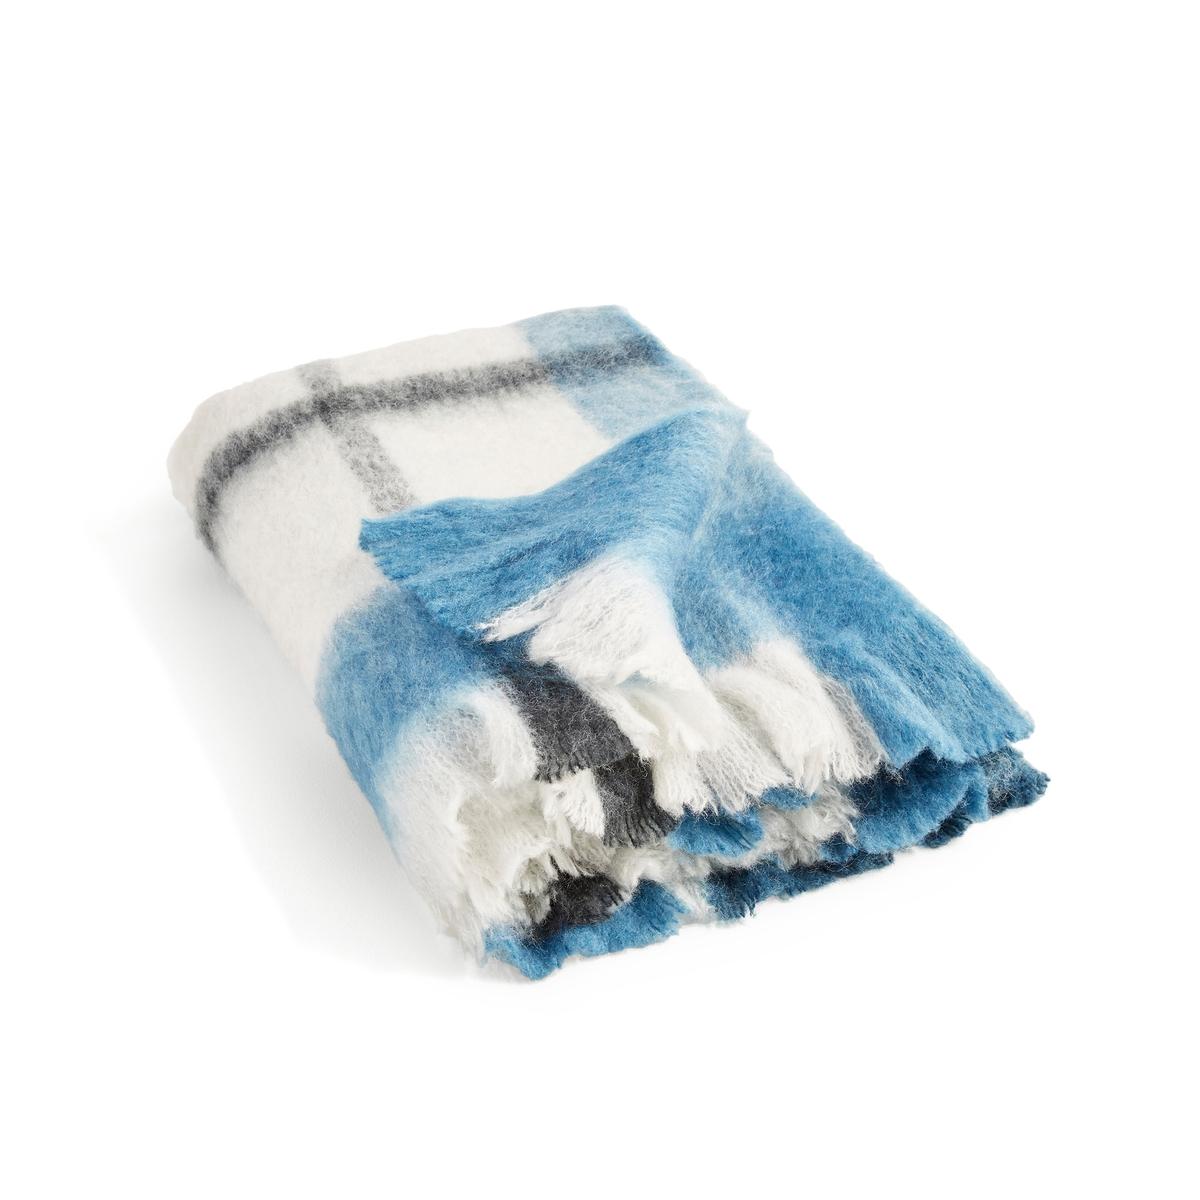 Плед La Redoute В клетку Ladak 130 x 170 см синий